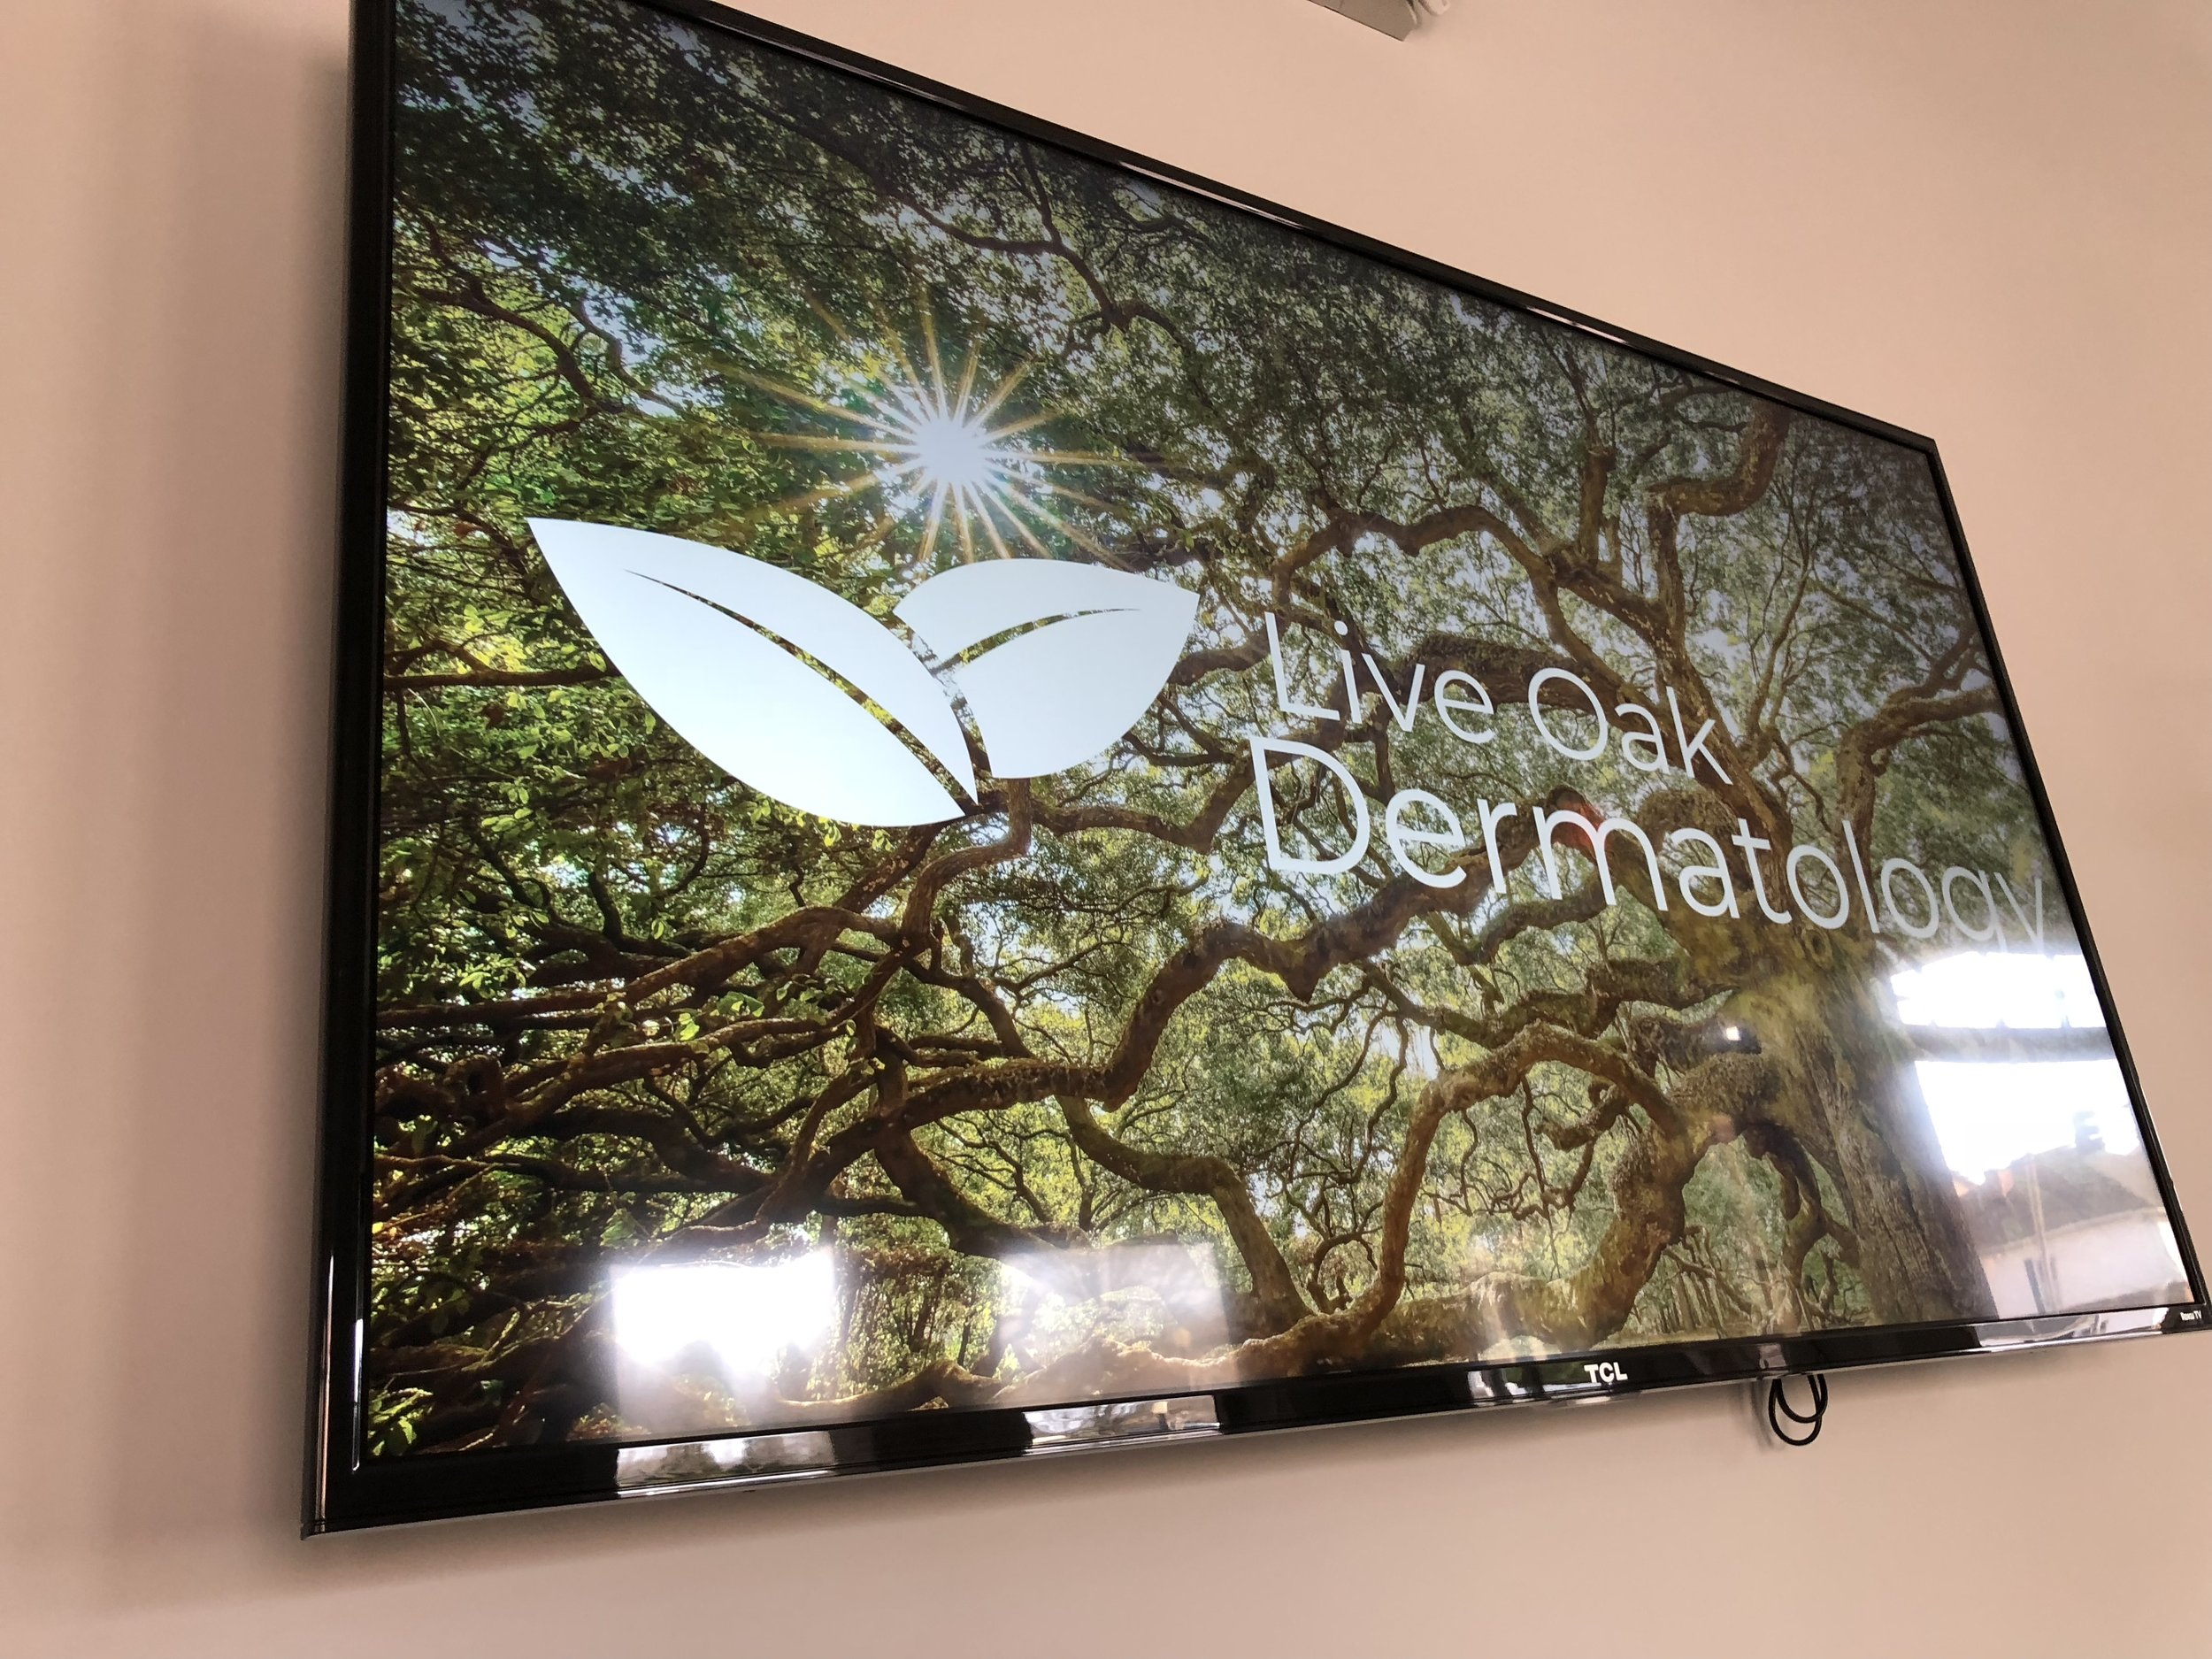 office logo on dispay TV.jpeg